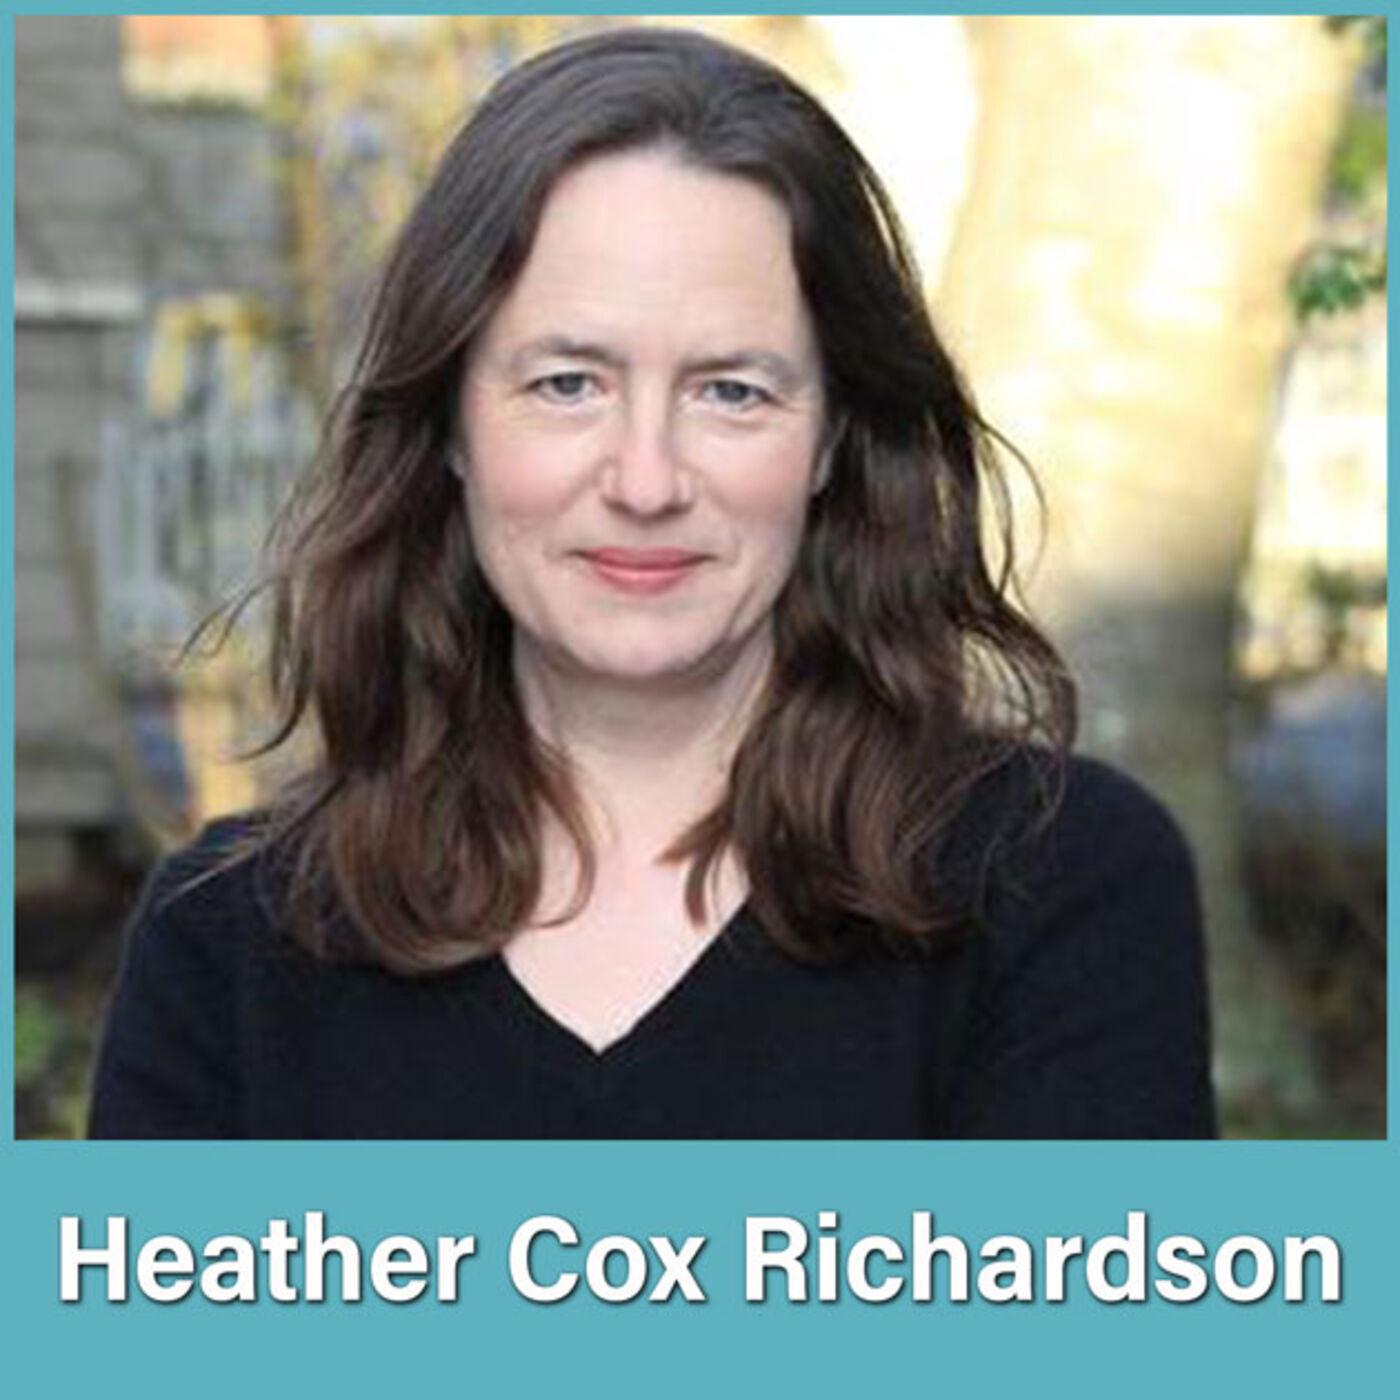 #8 Heather Cox Richardson